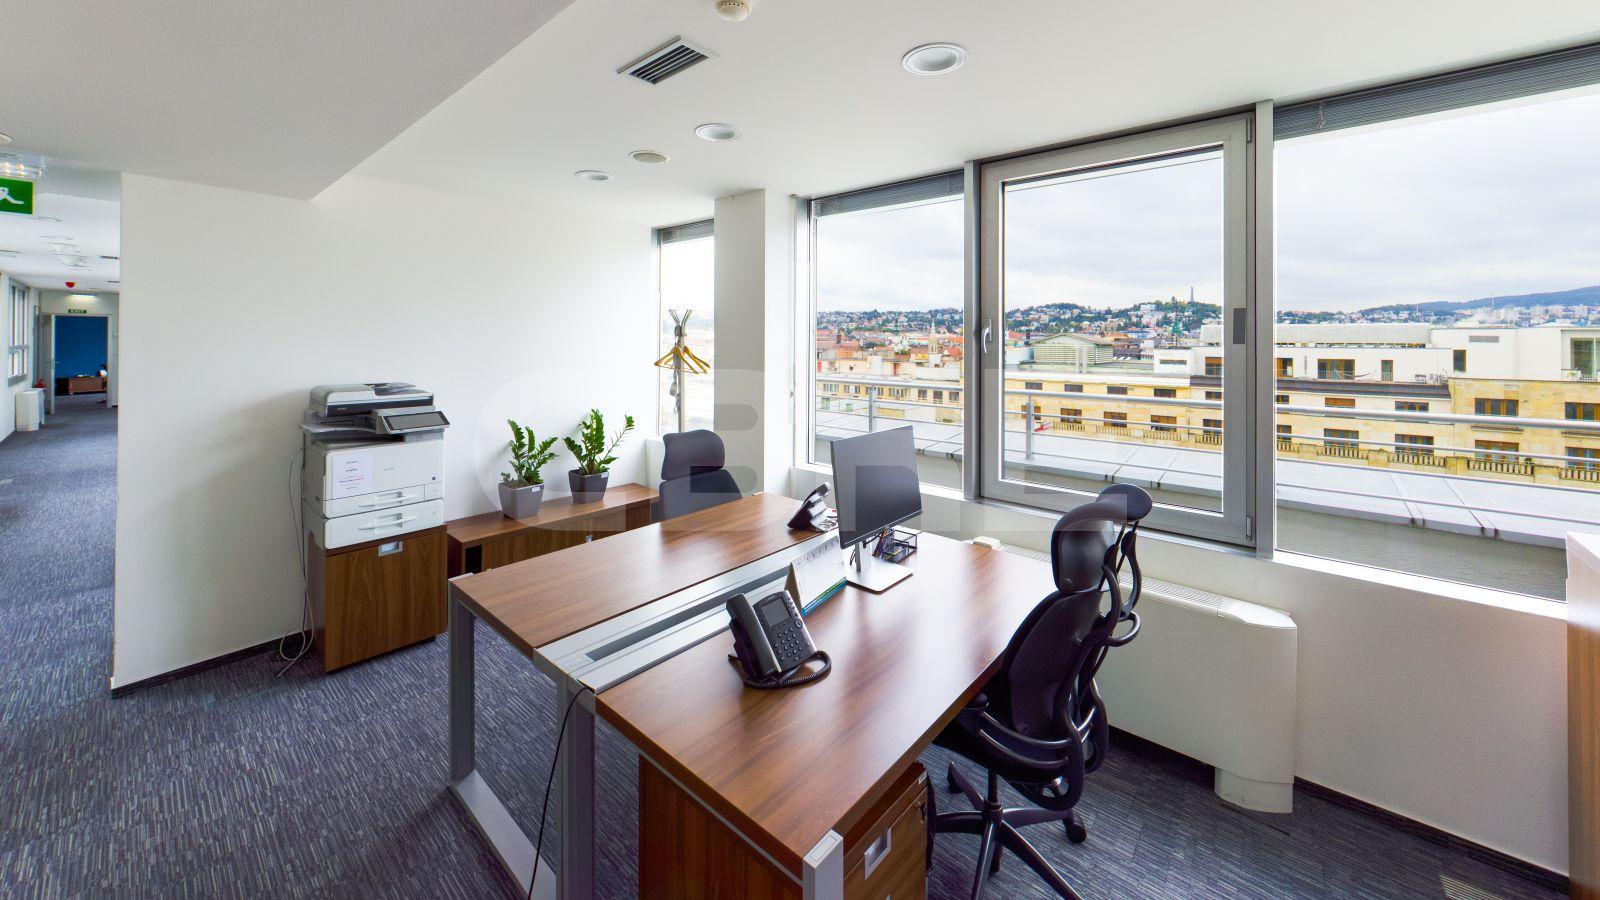 Pressburg Trade Center, Bratislava - Staré Mesto | Offices for rent by CBRE | 3